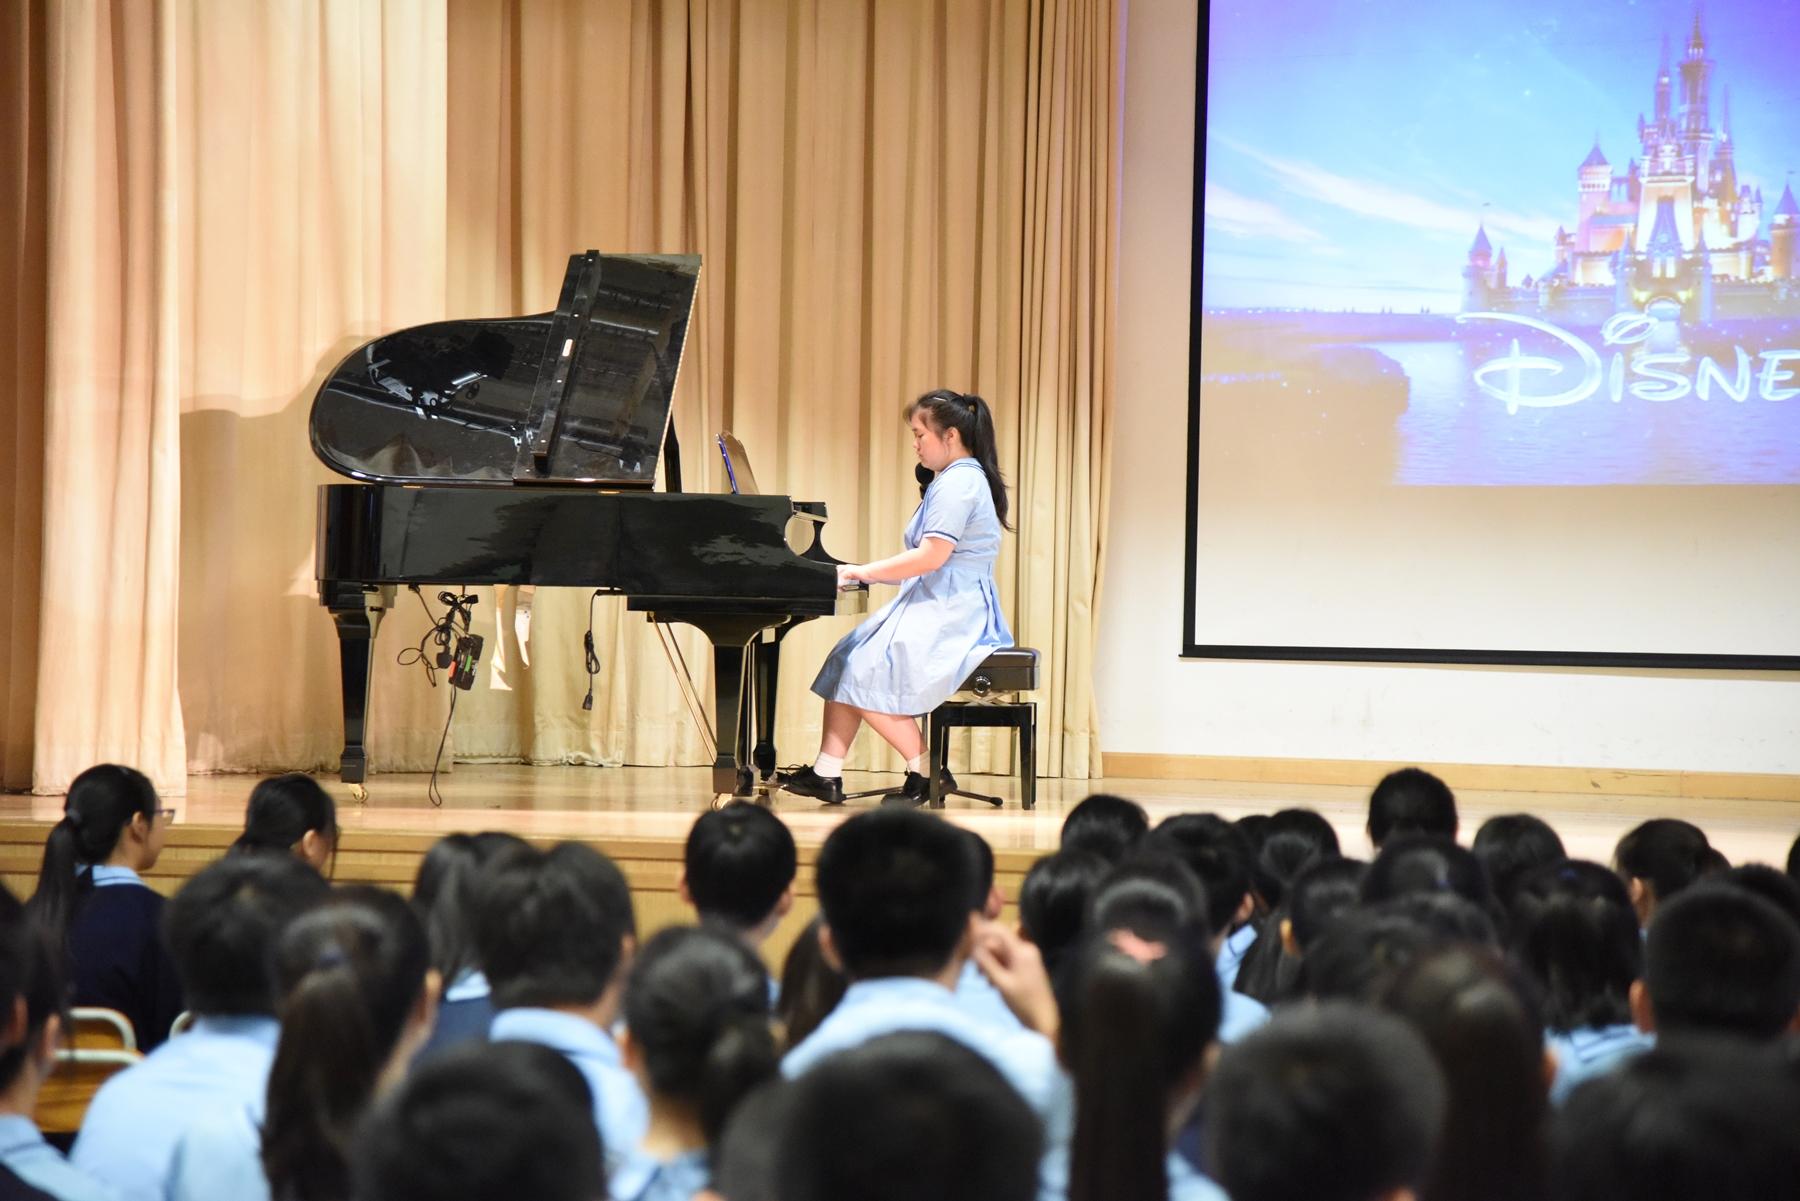 http://npc.edu.hk/sites/default/files/dsc_0186_1.jpg